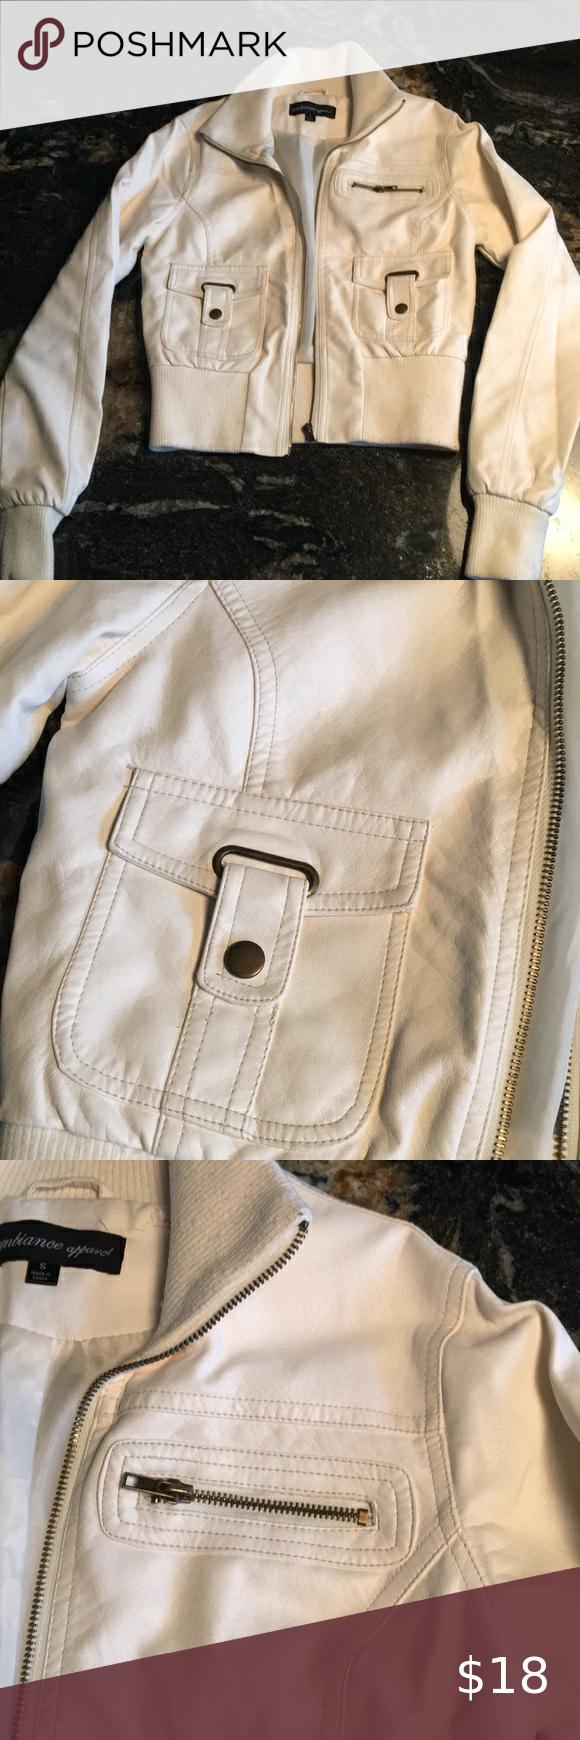 White Faux Leather Jacket In 2020 White Faux Leather Jackets White Leather Jacket Vegan Leather Jacket [ 1740 x 580 Pixel ]